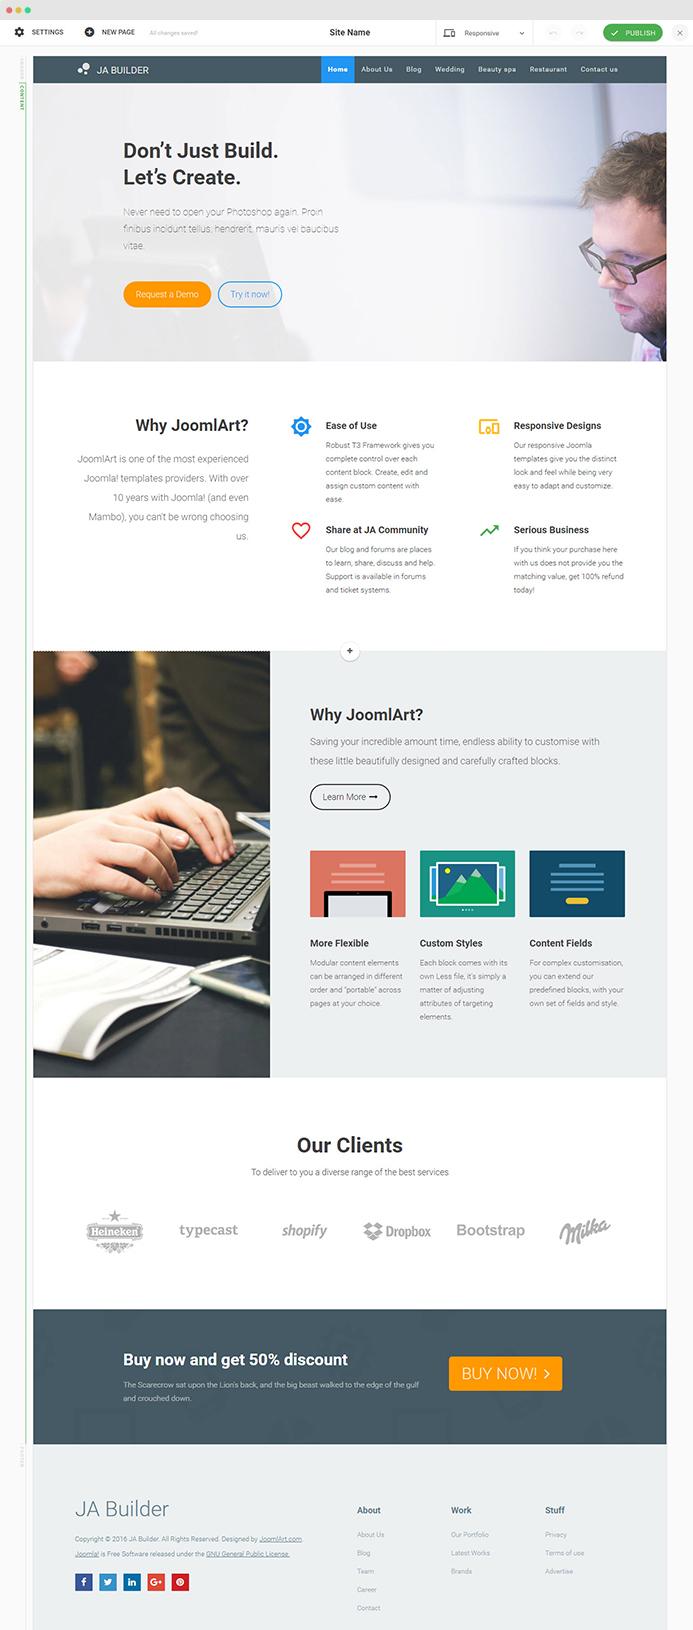 Joomla Page Builder Create Stunning Landing Page In Minutes - Joomla landing page template